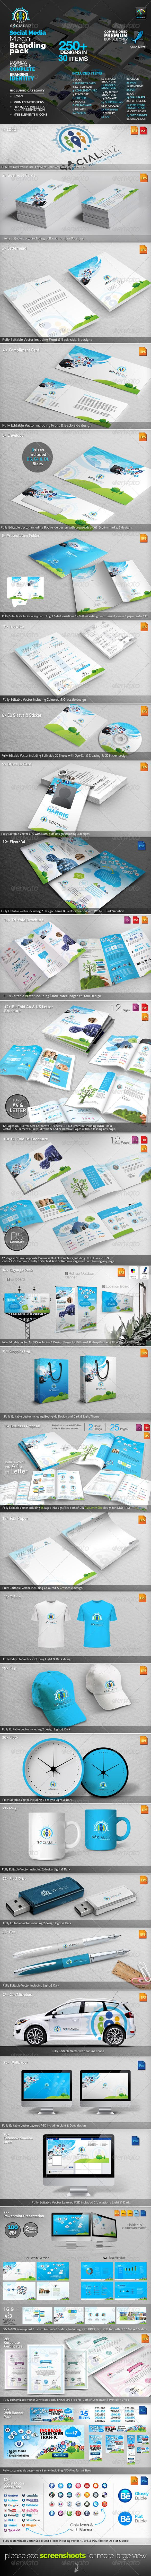 GraphicRiver SocialBiz Social Media ID Mega Branding Pack 5676478